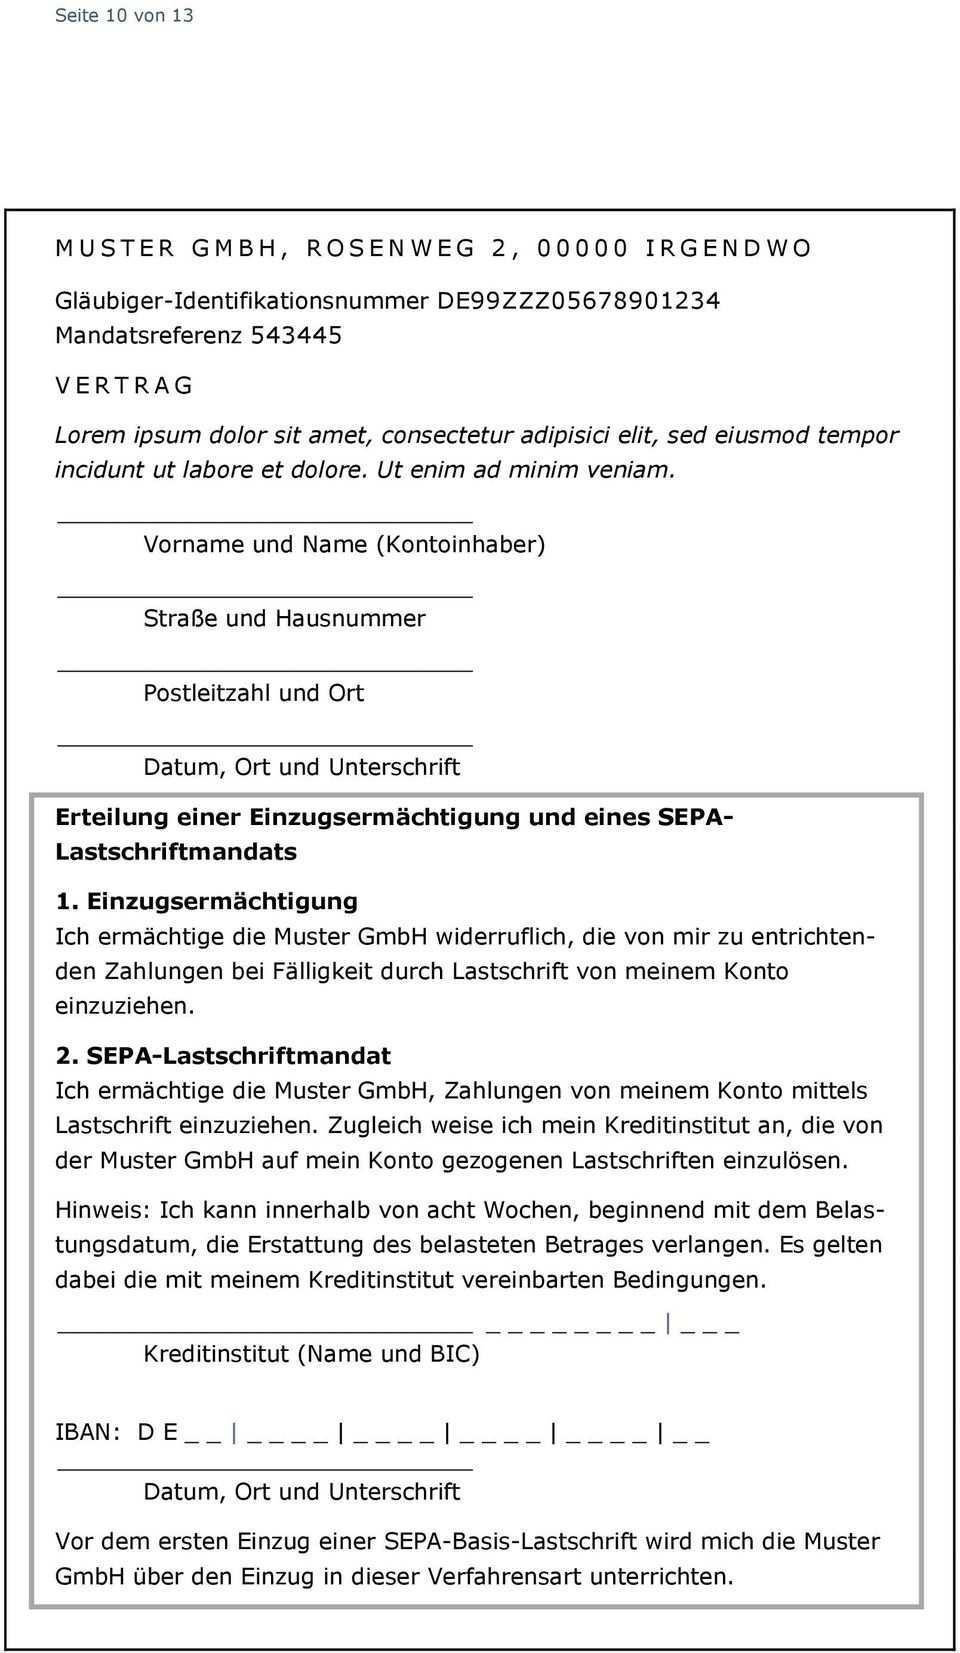 1 1 Sepa Lastschriftmandat Als Separates Formular Pdf Kostenfreier Download